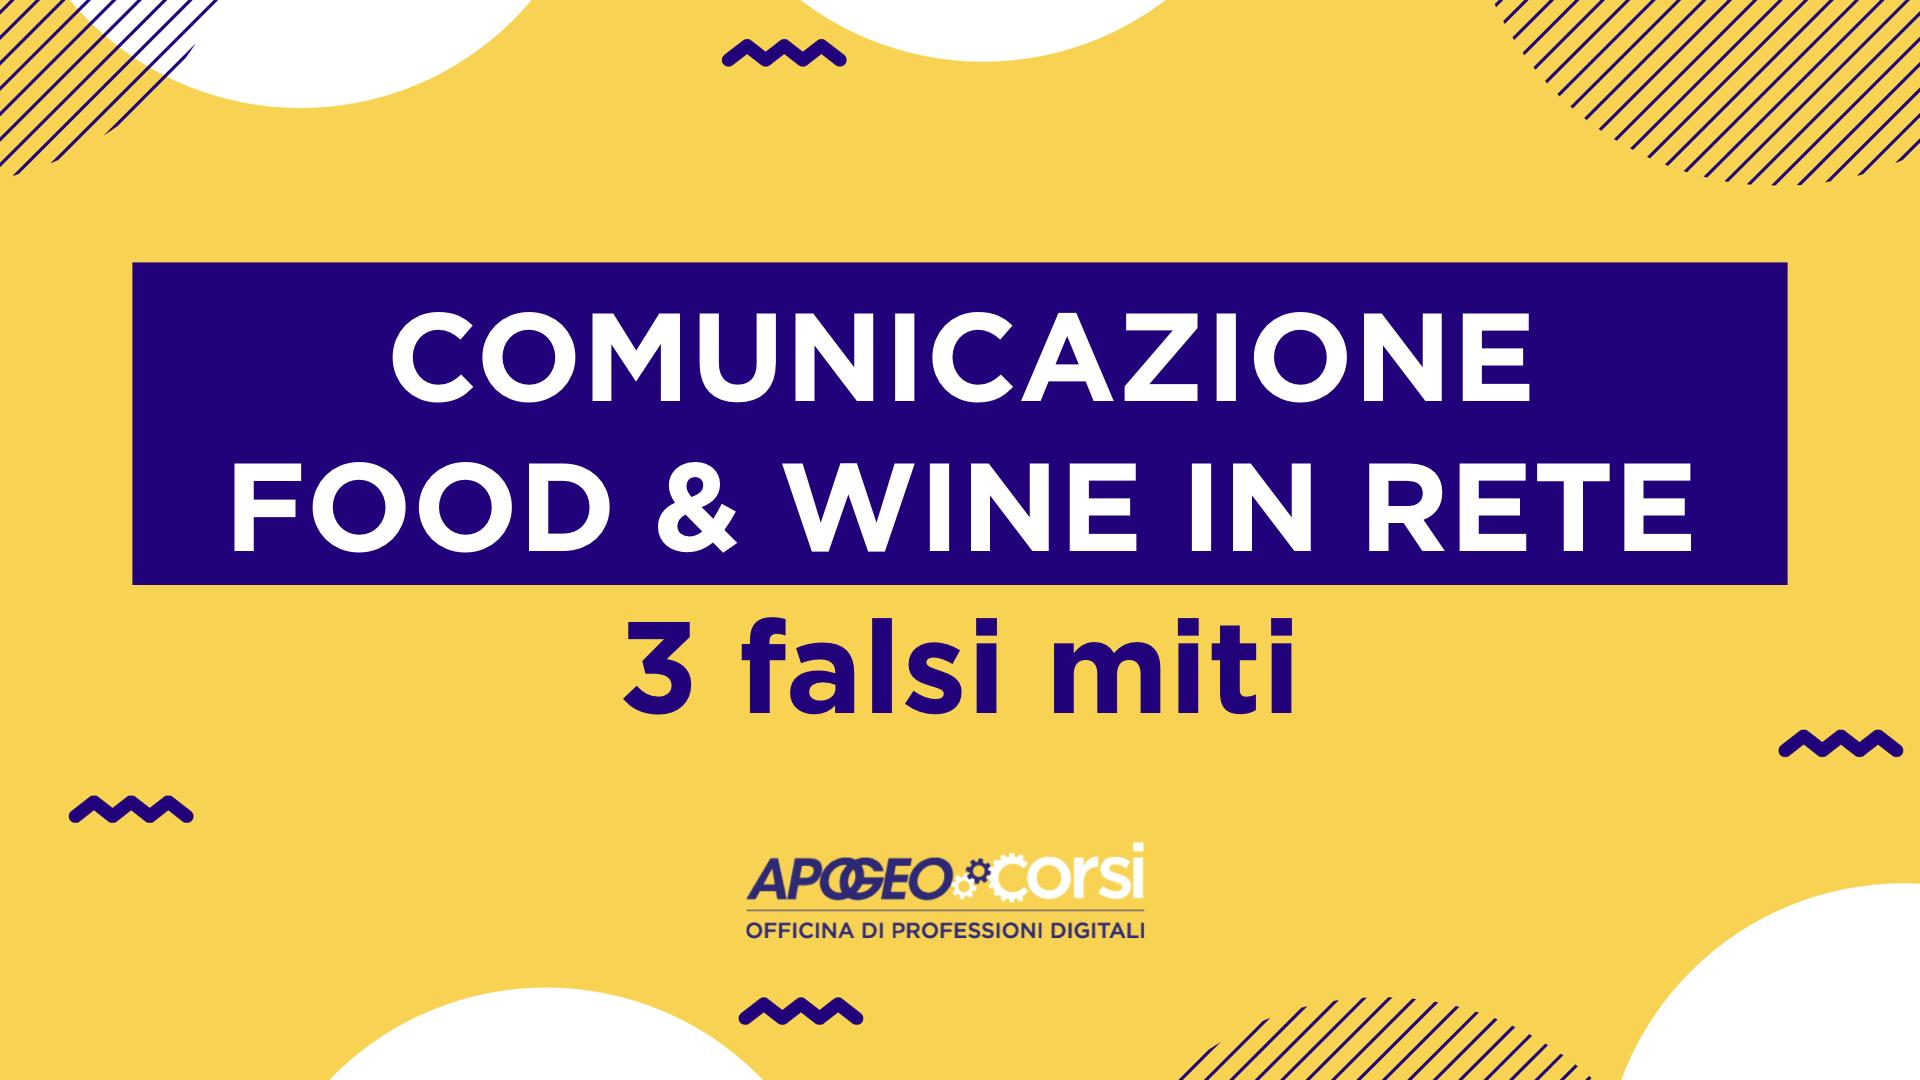 Comunicazione Food & Wine in Rete: 3 falsi miti